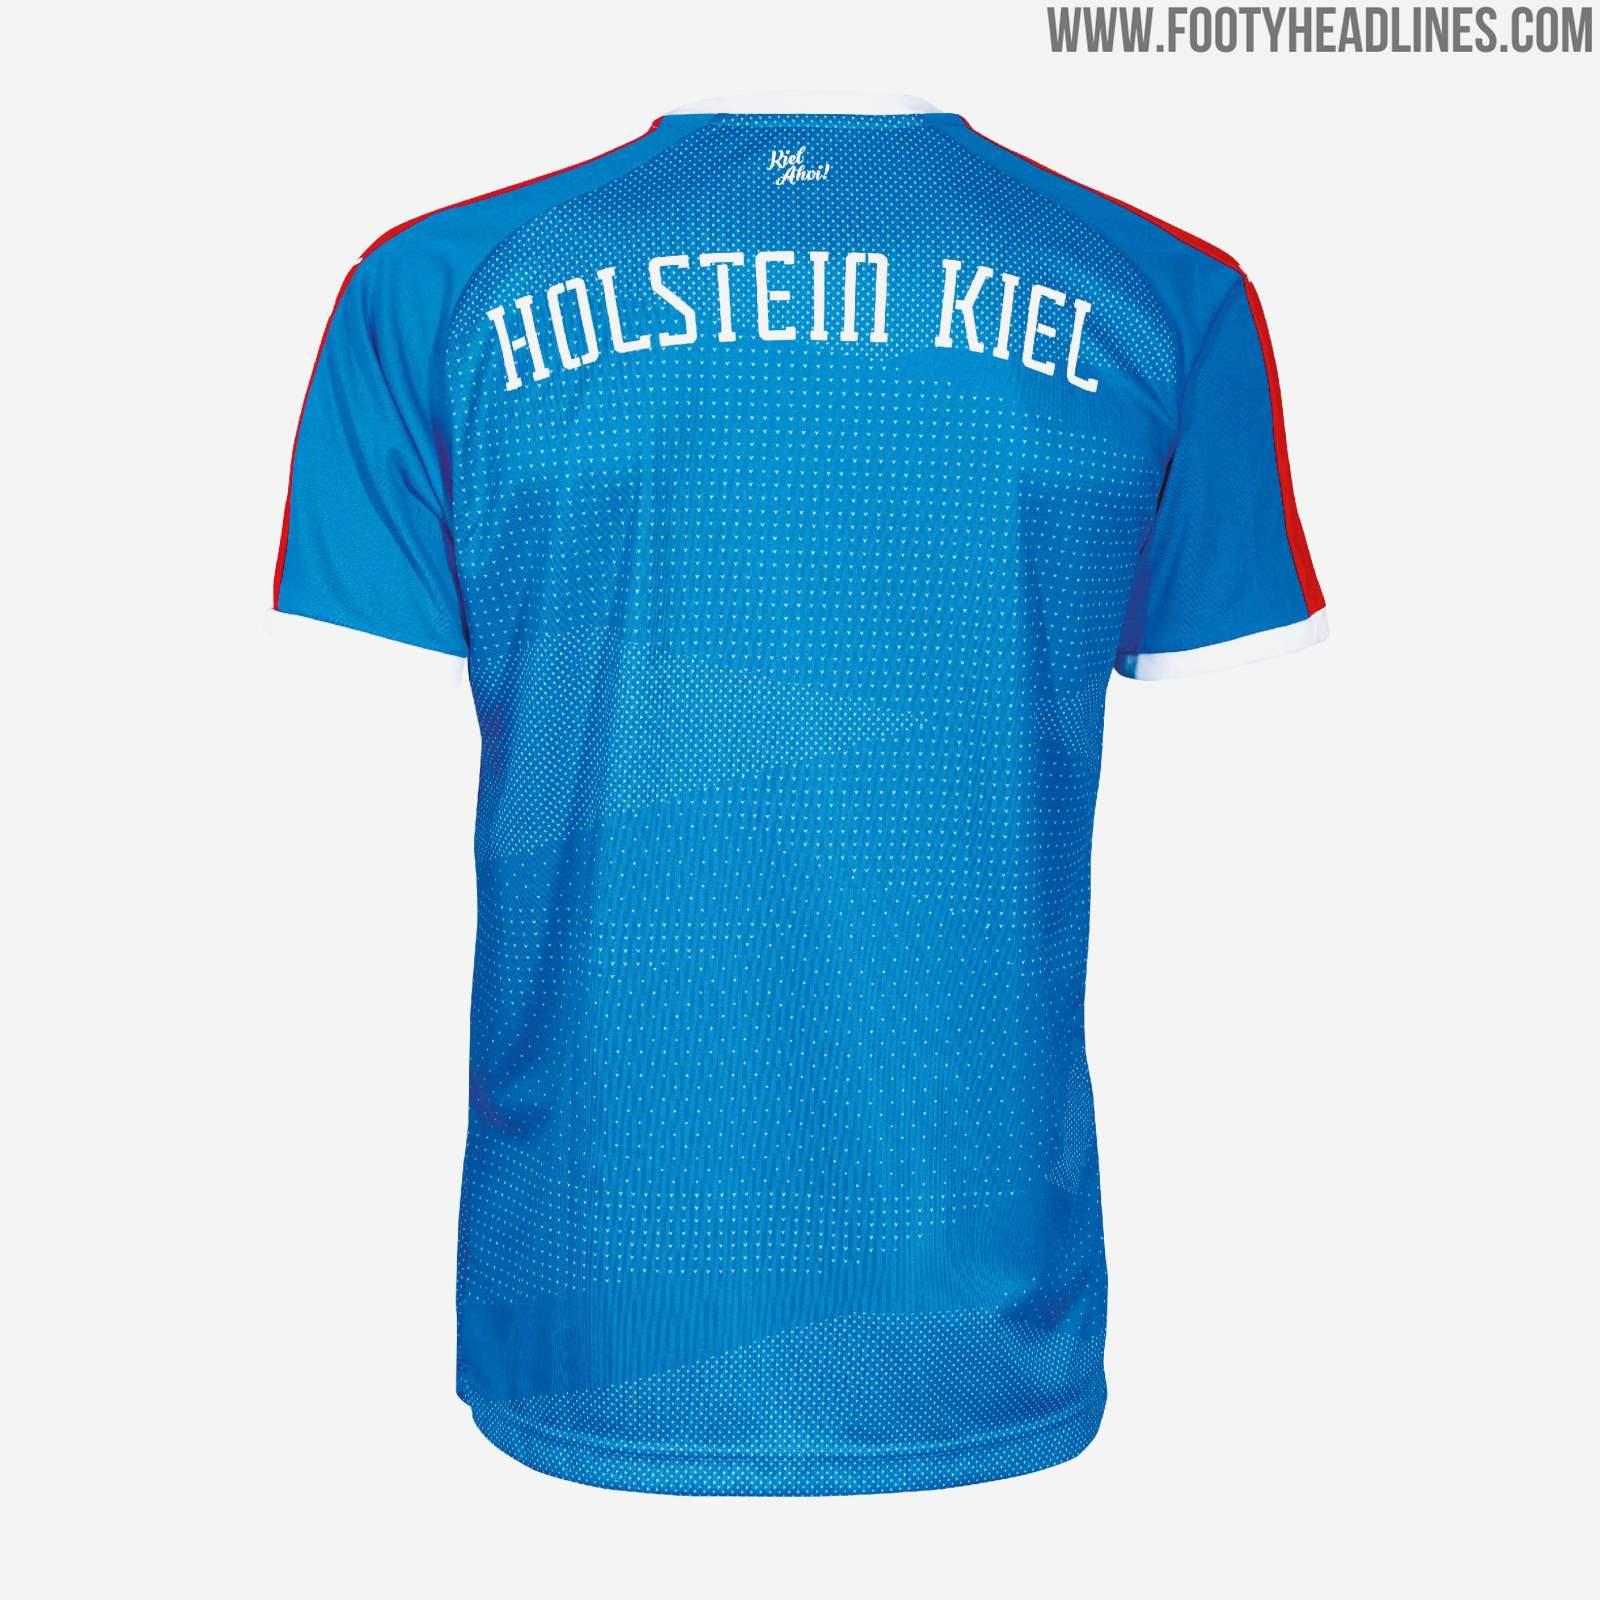 Holstein Kiel 19-20 Home Kit Released - Footy Headlines